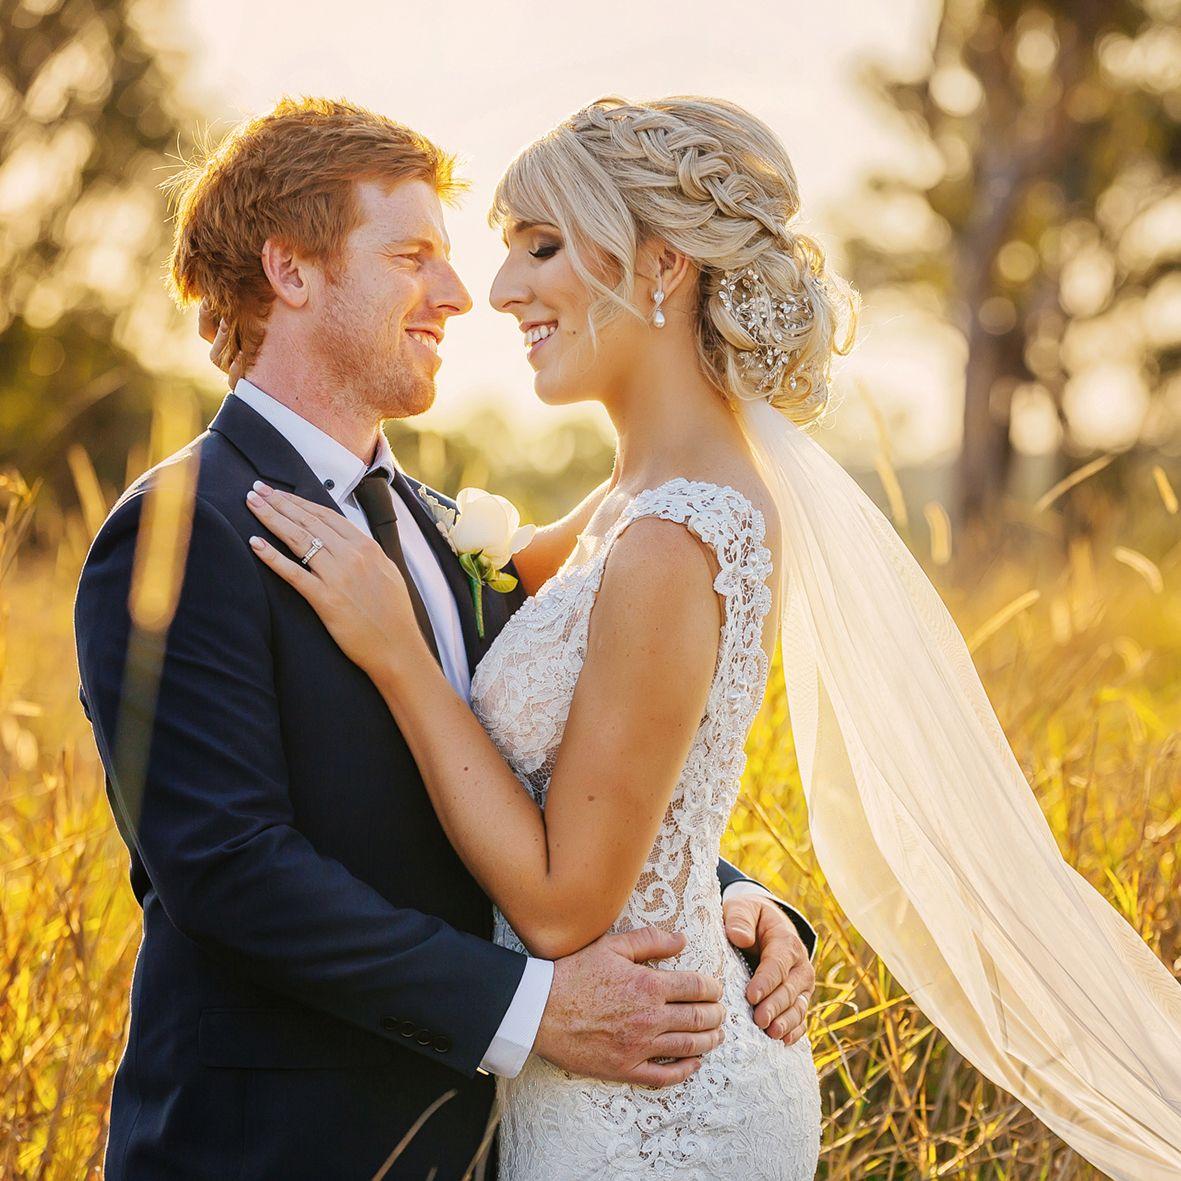 Precious Moments Post Ceremony At @weddingsatsirromet